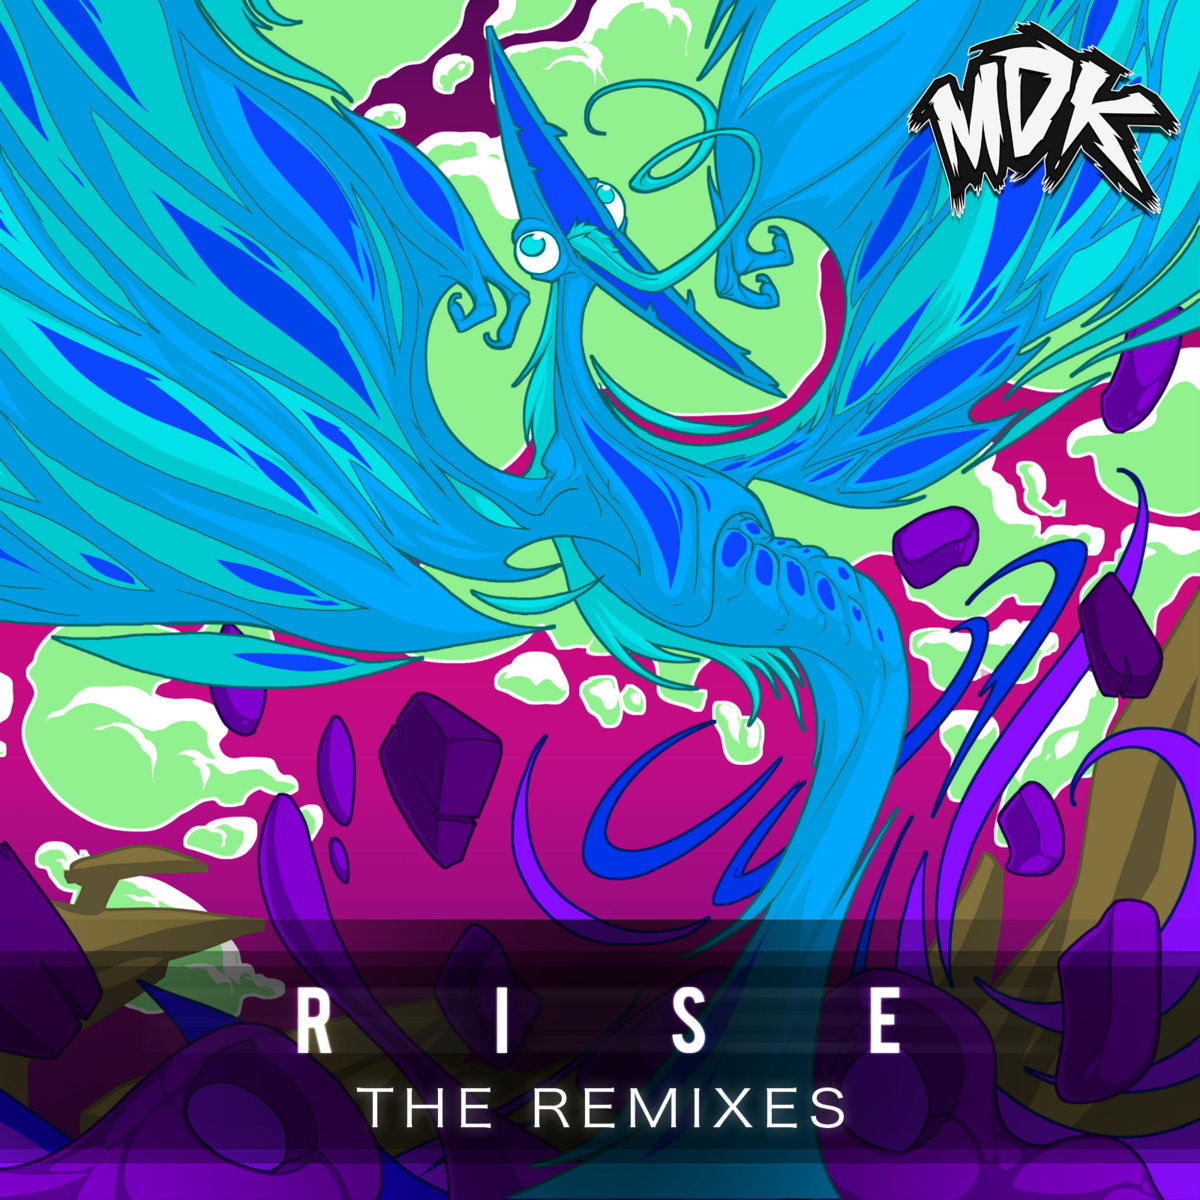 pimp remix free download